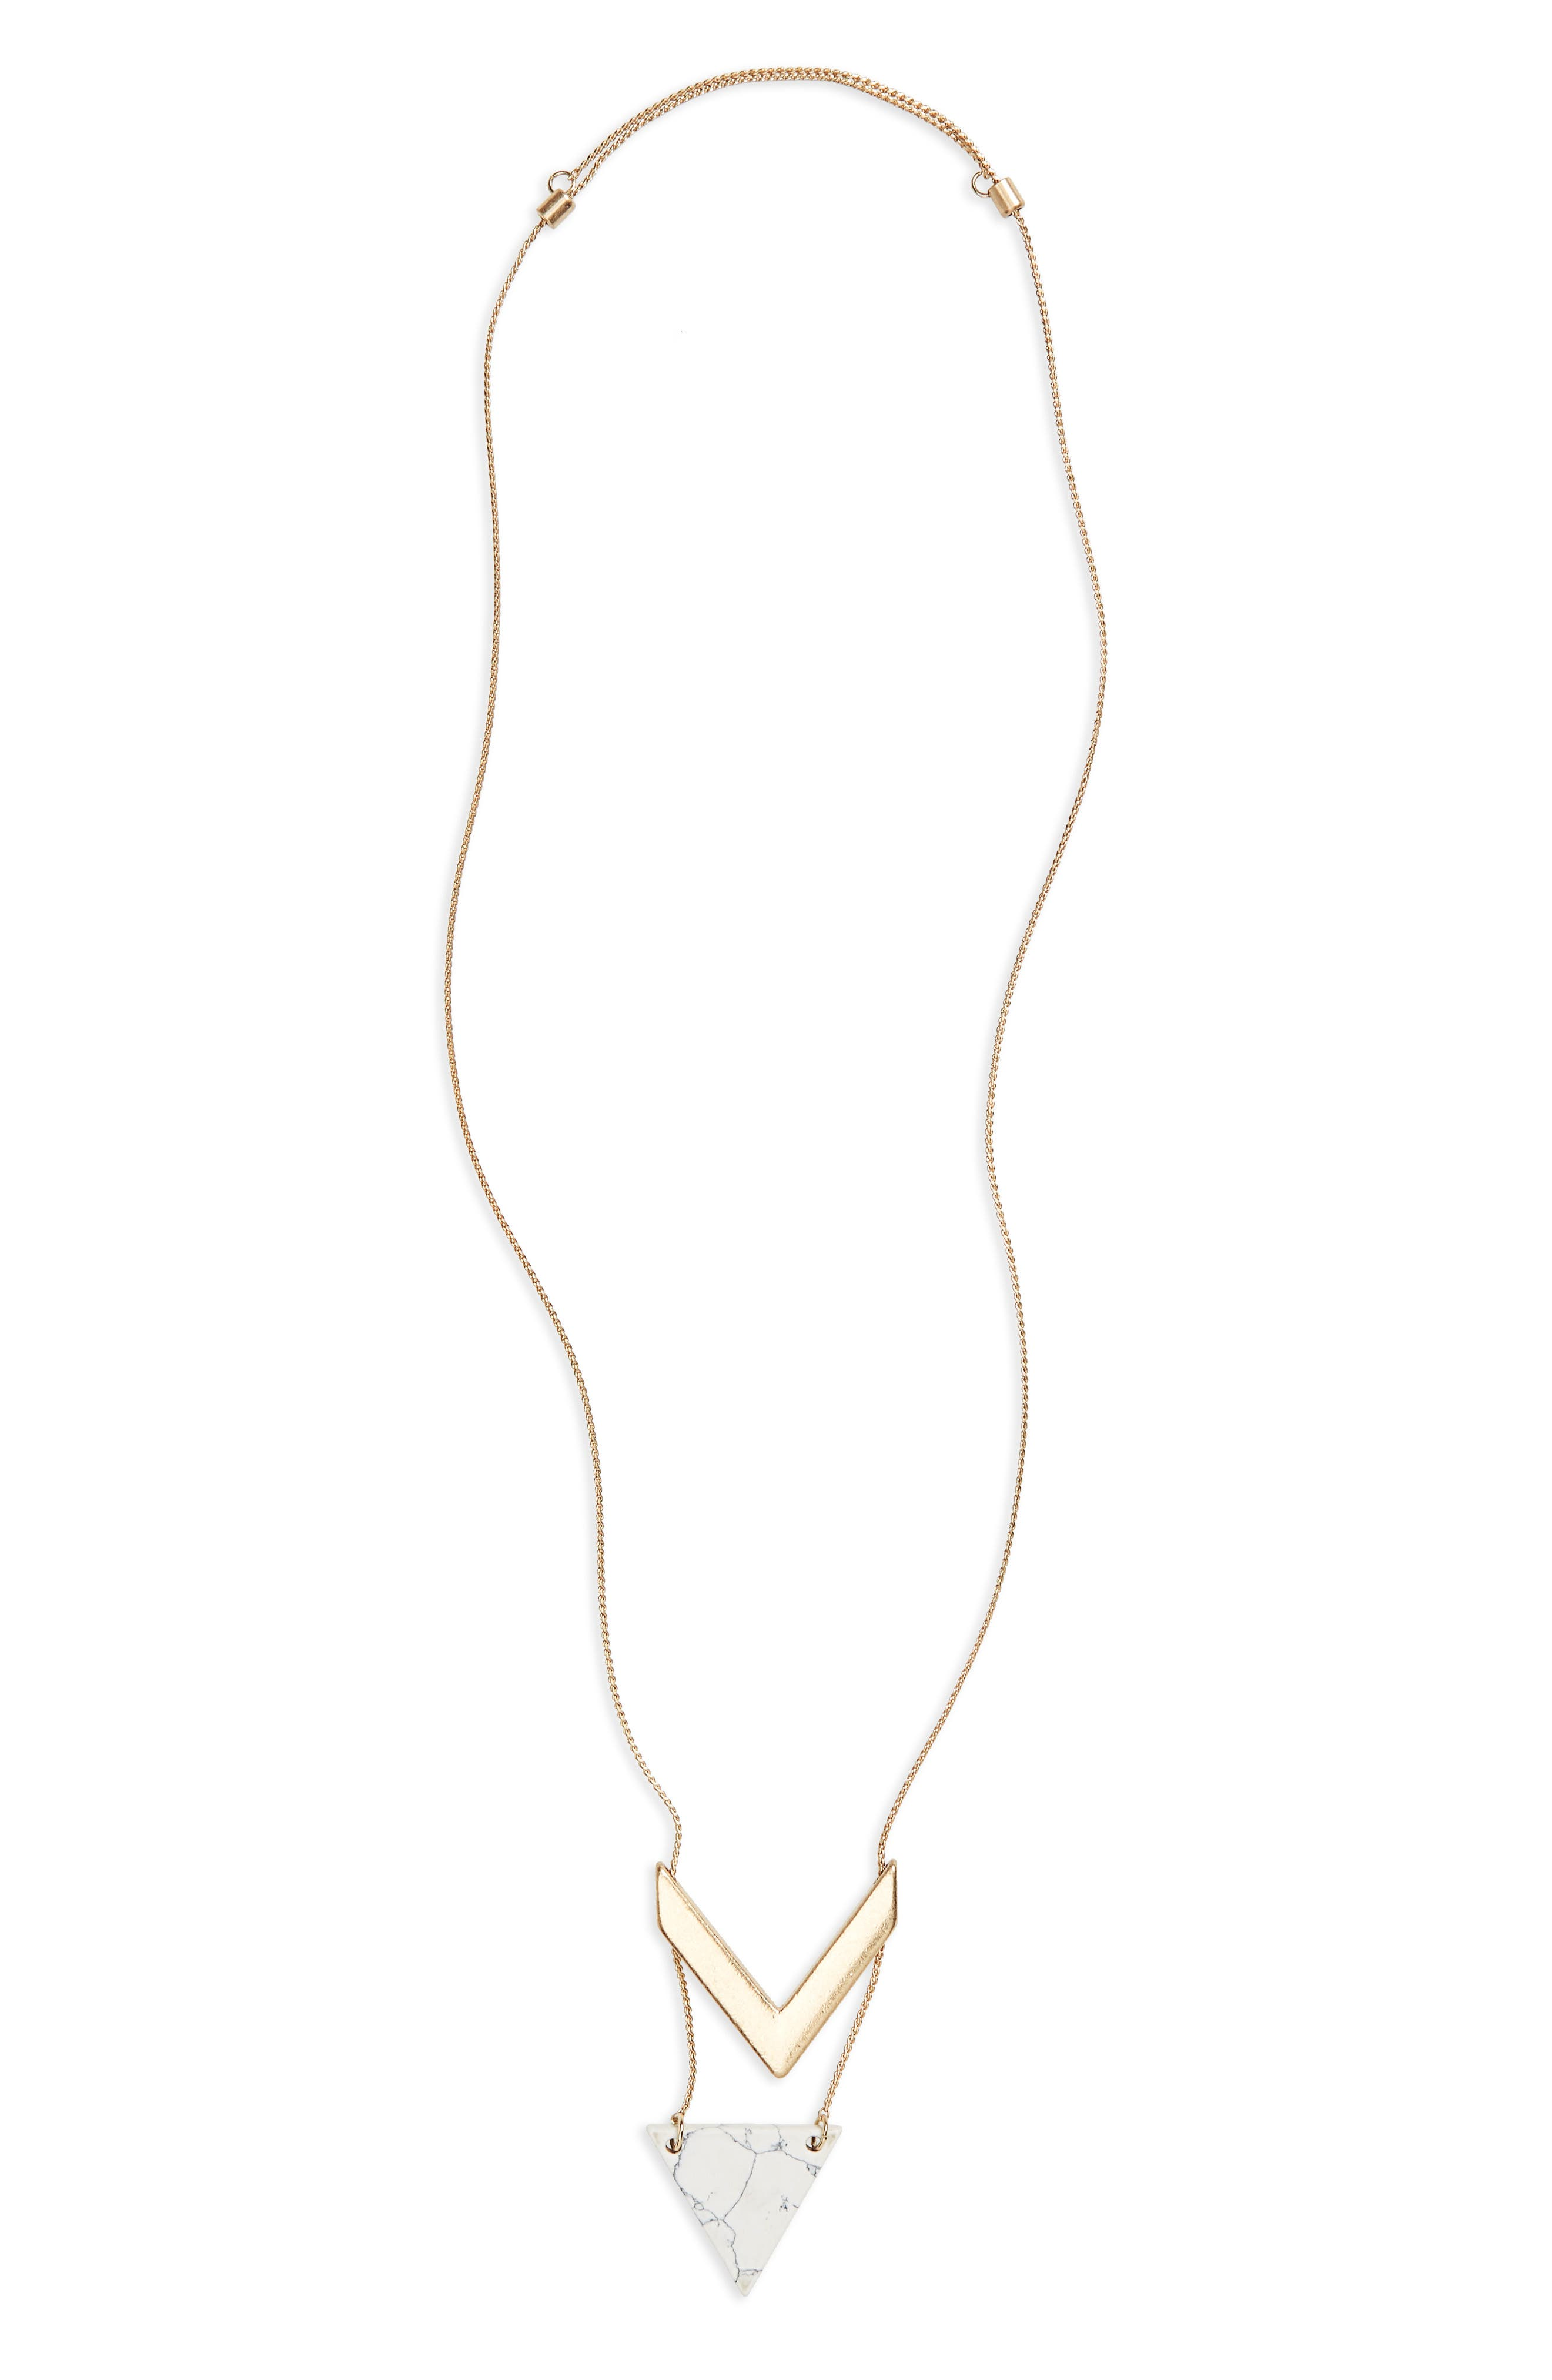 Stone Chevron Pendant Necklace,                         Main,                         color, Gold/ Marble